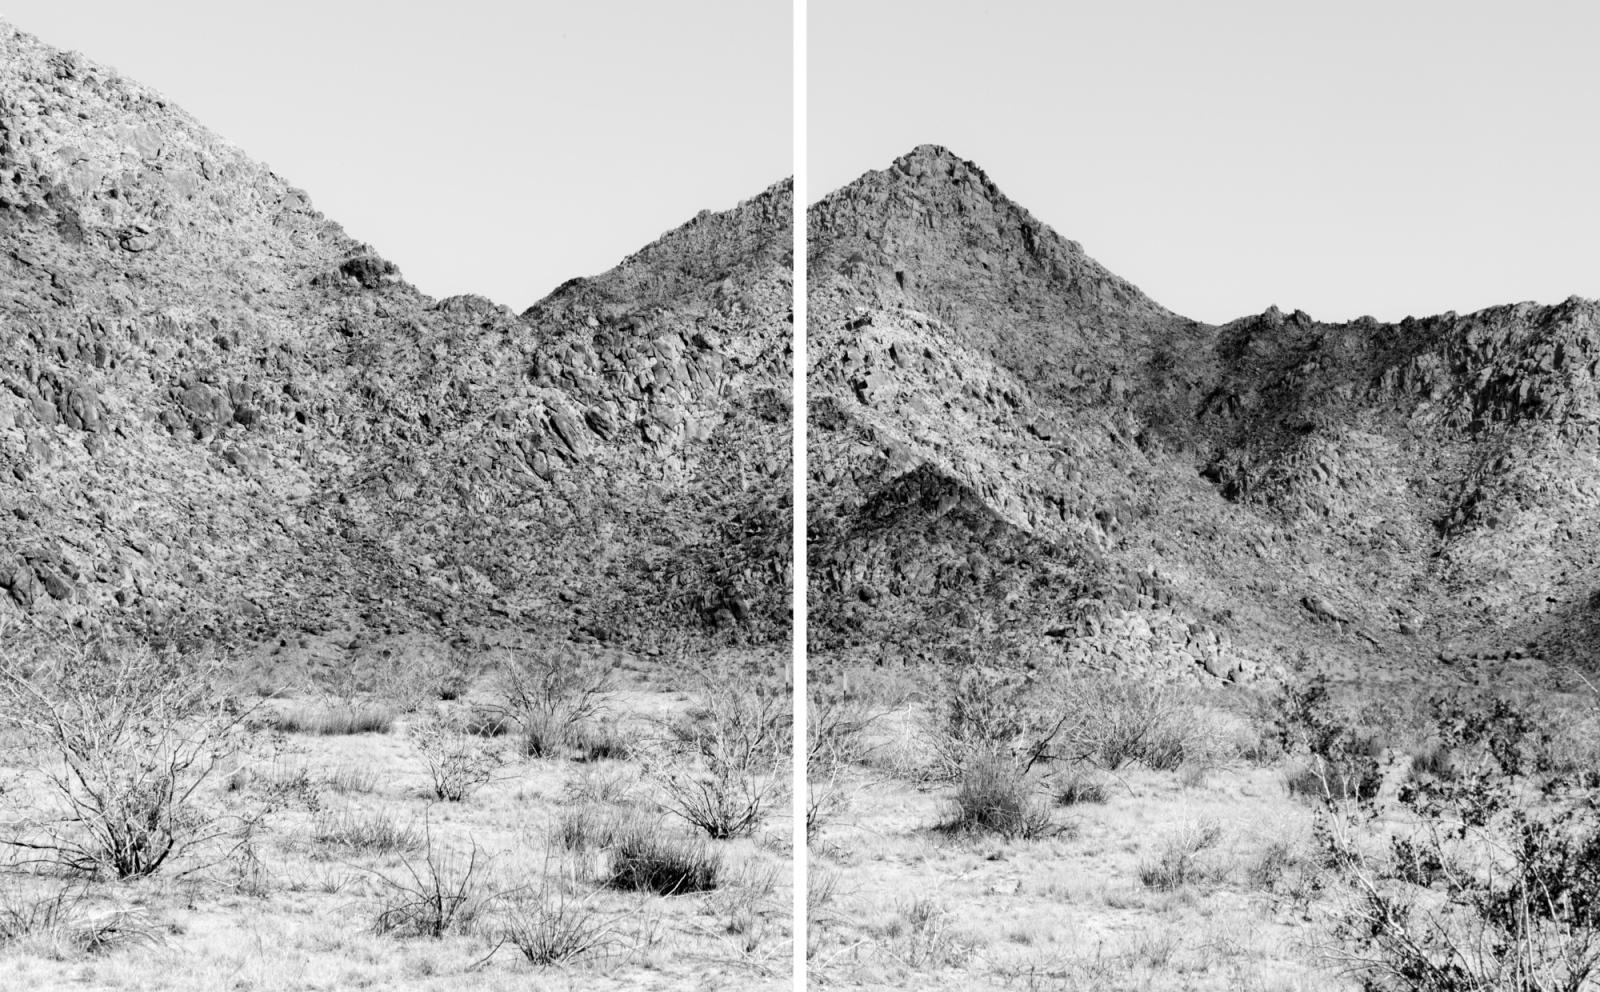 Art and Documentary Photography - Loading 2xmojavelandscape.jpg